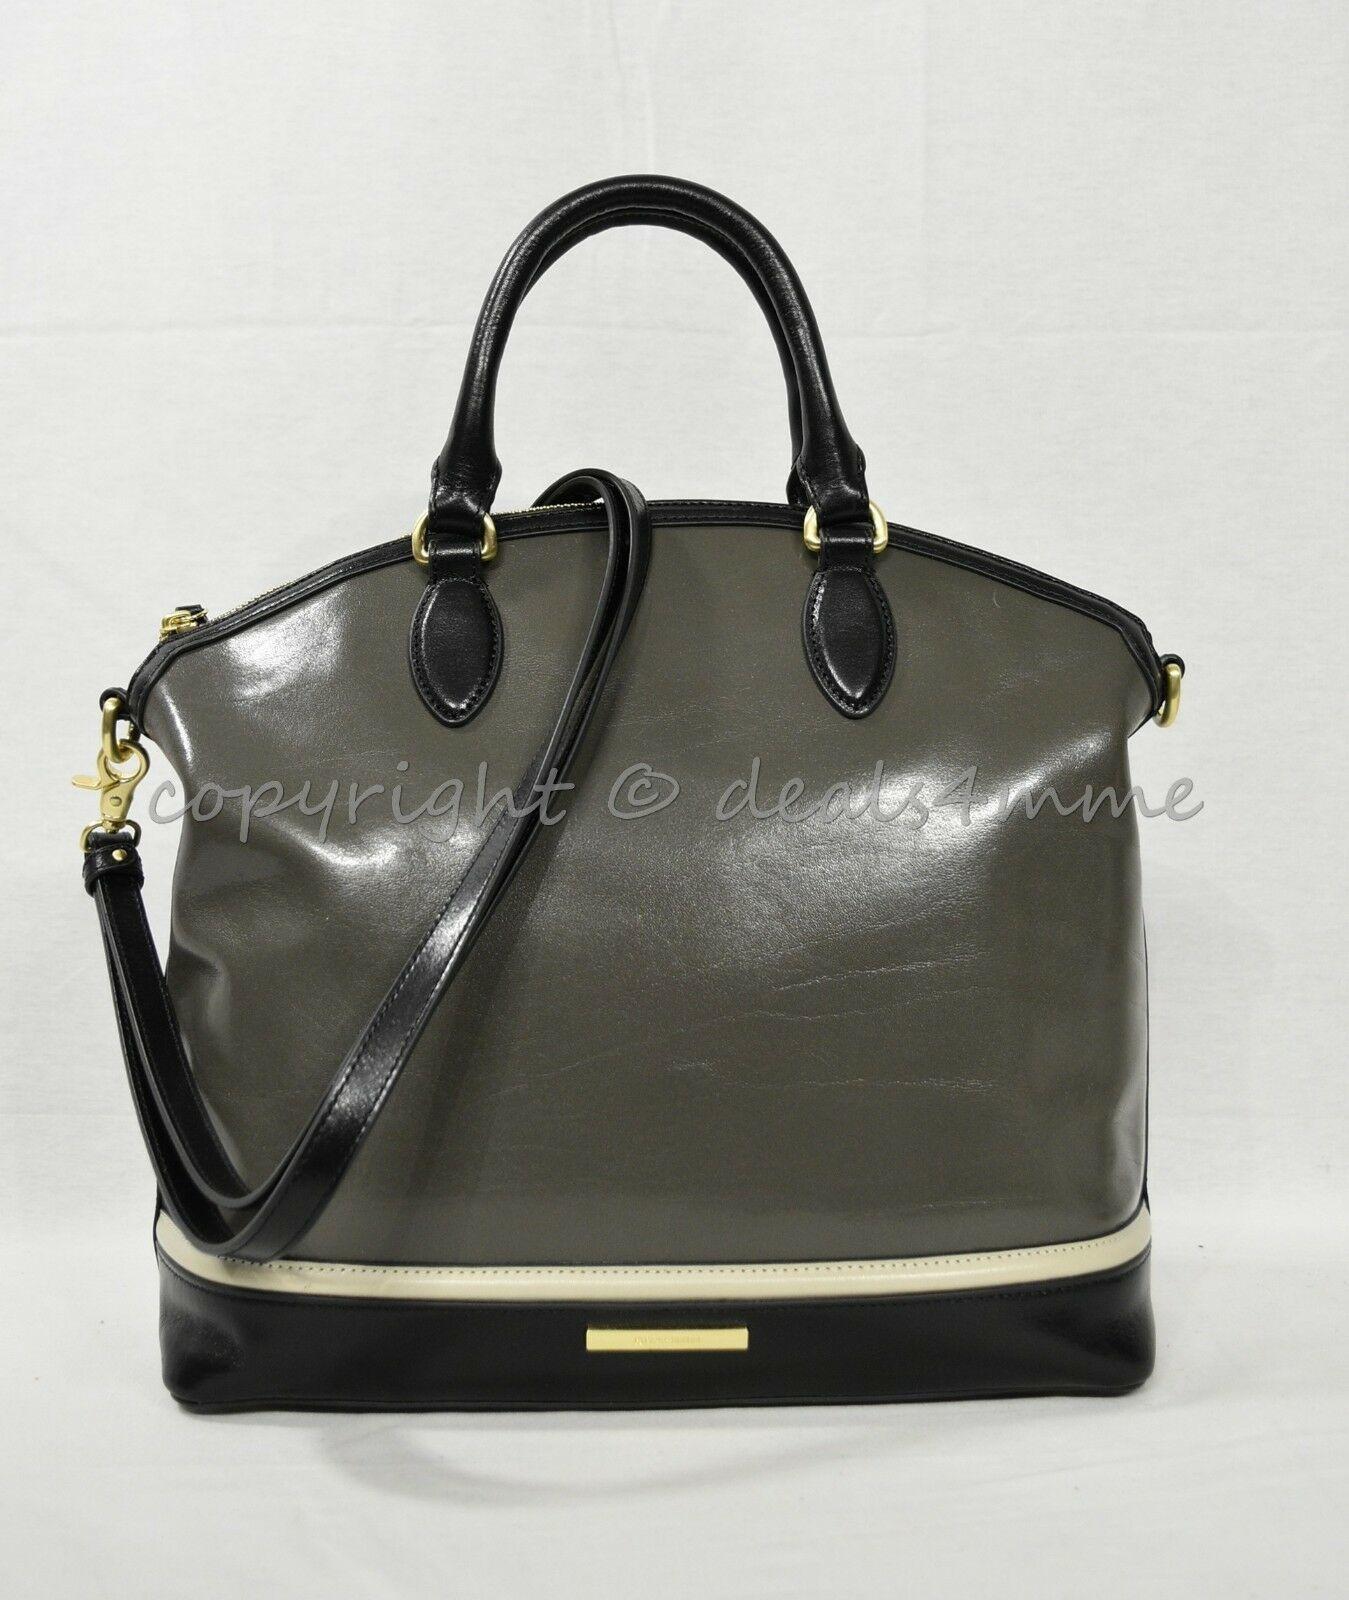 NWD Brahmin Large Duxbury Satchel/Shoulder Bag in Charcoal Westport